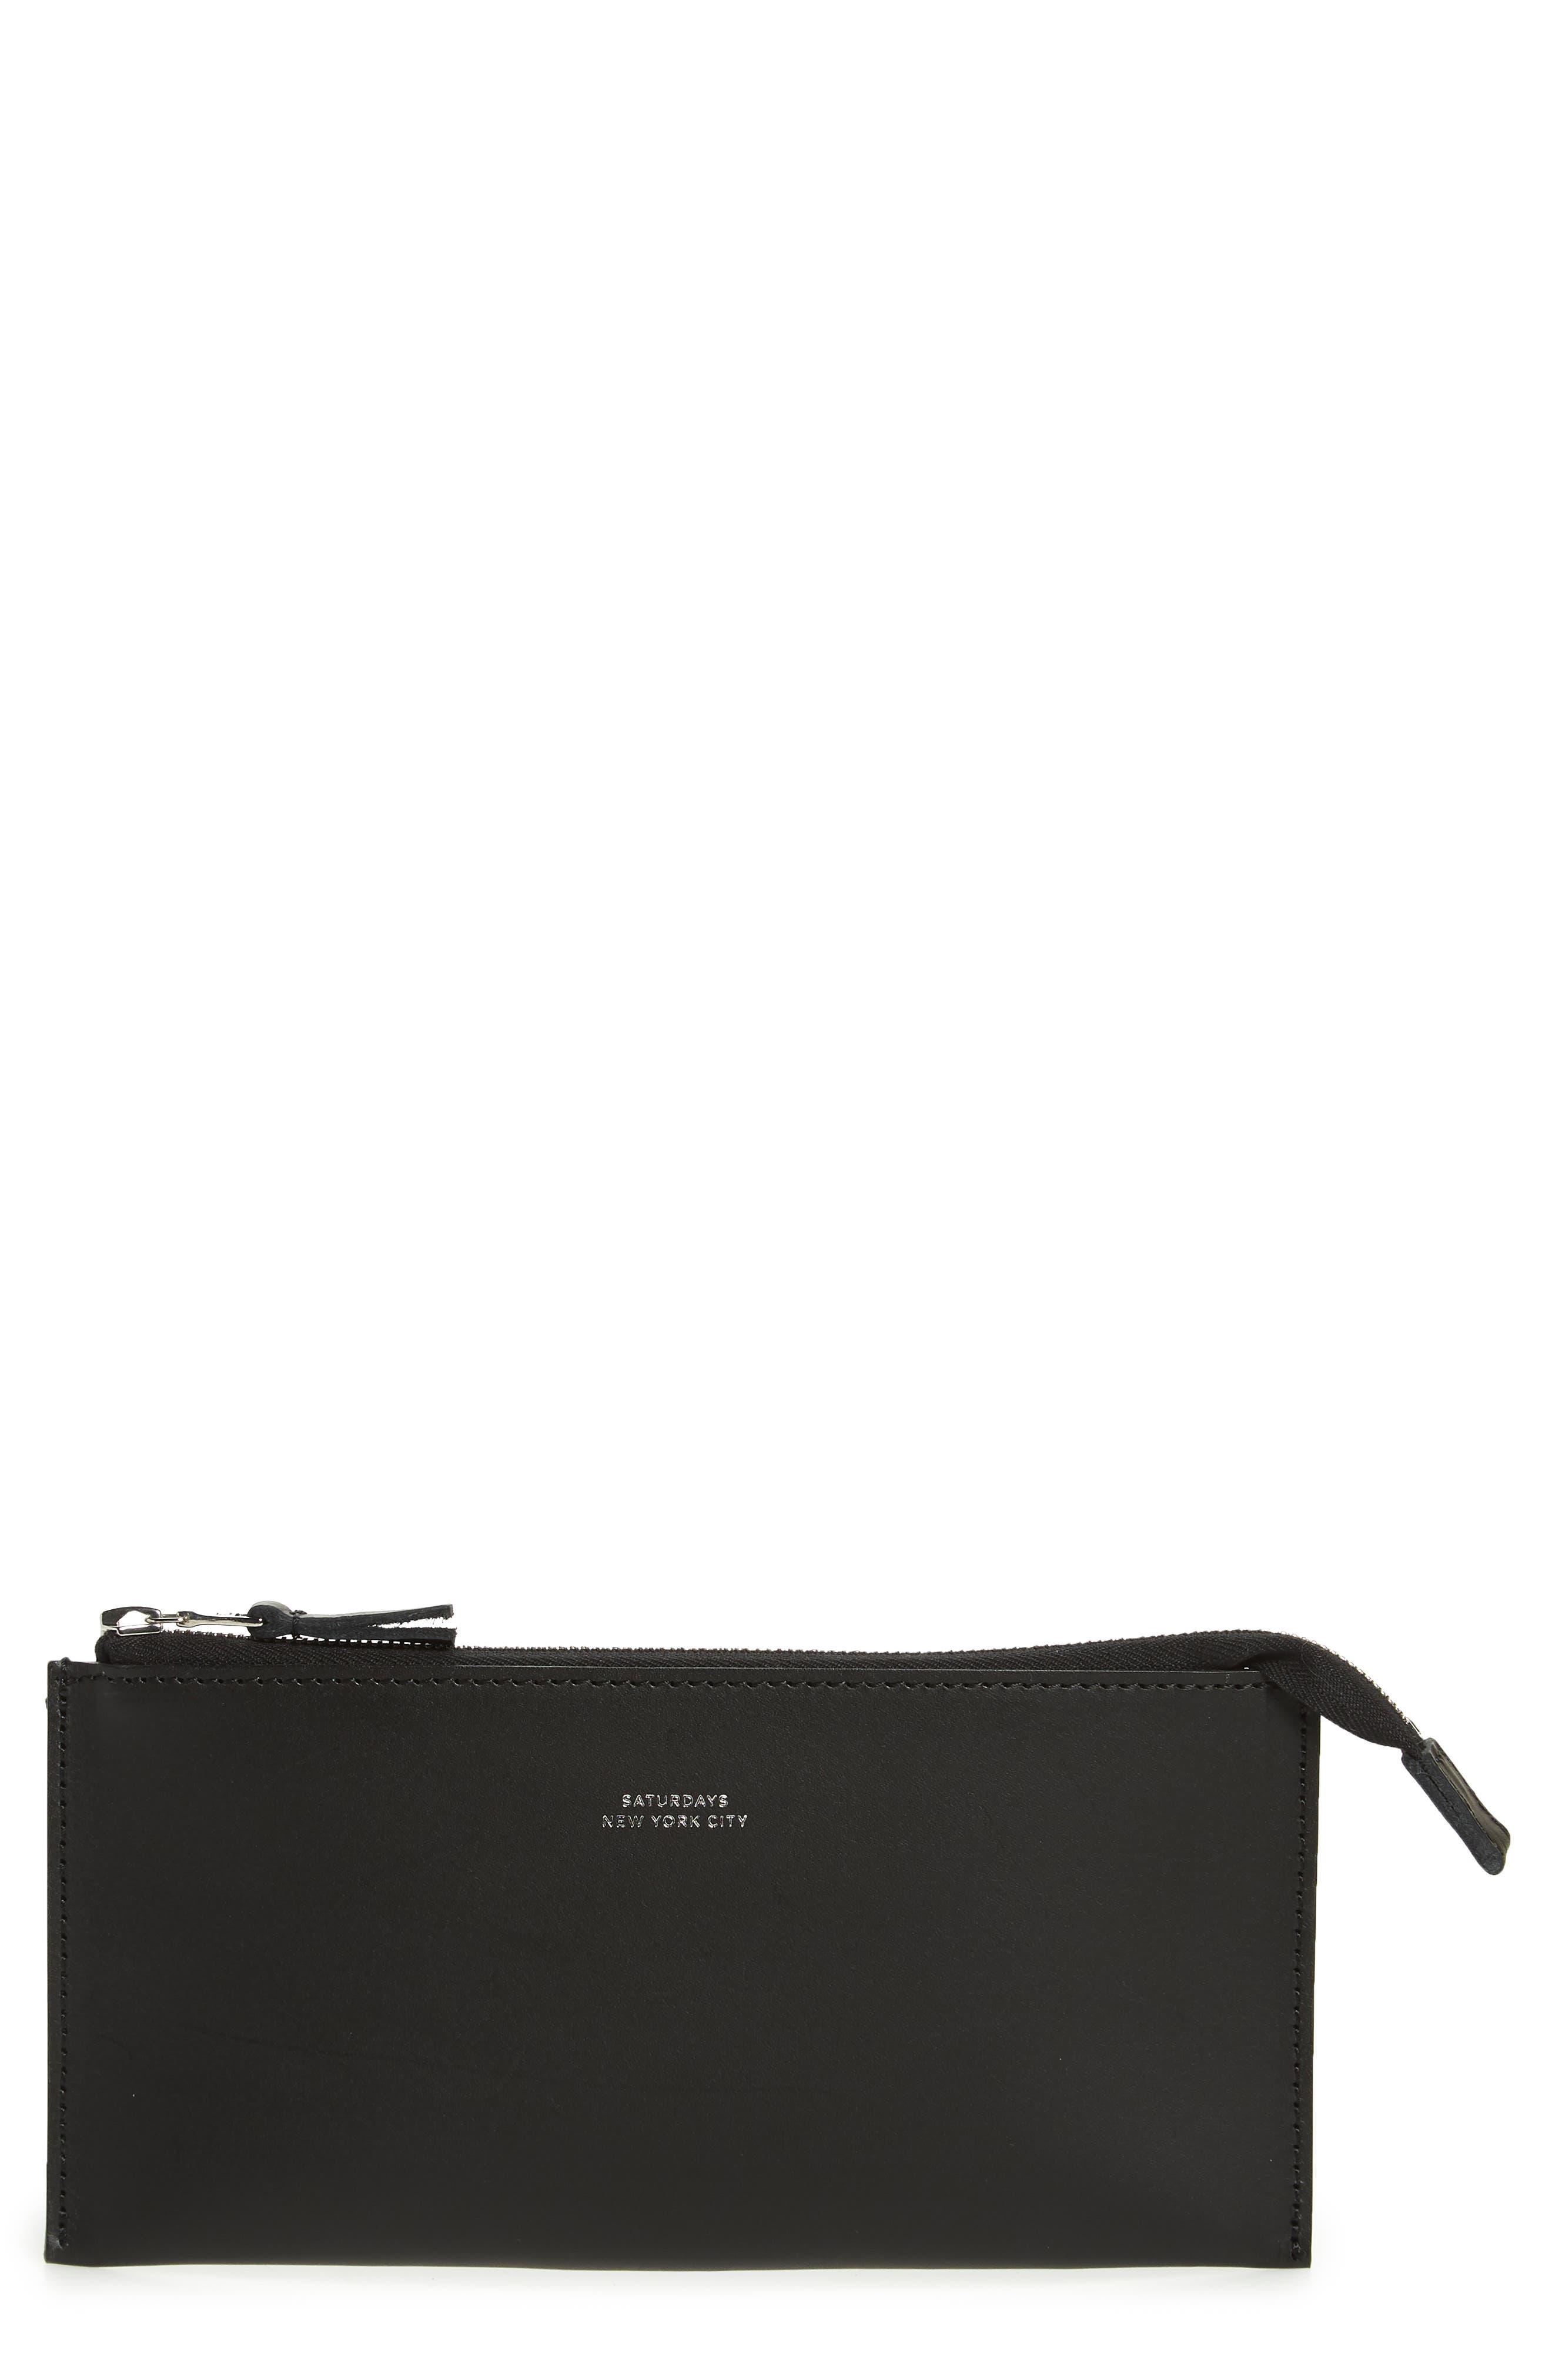 Kirk Zip wallet,                             Main thumbnail 1, color,                             BLACK